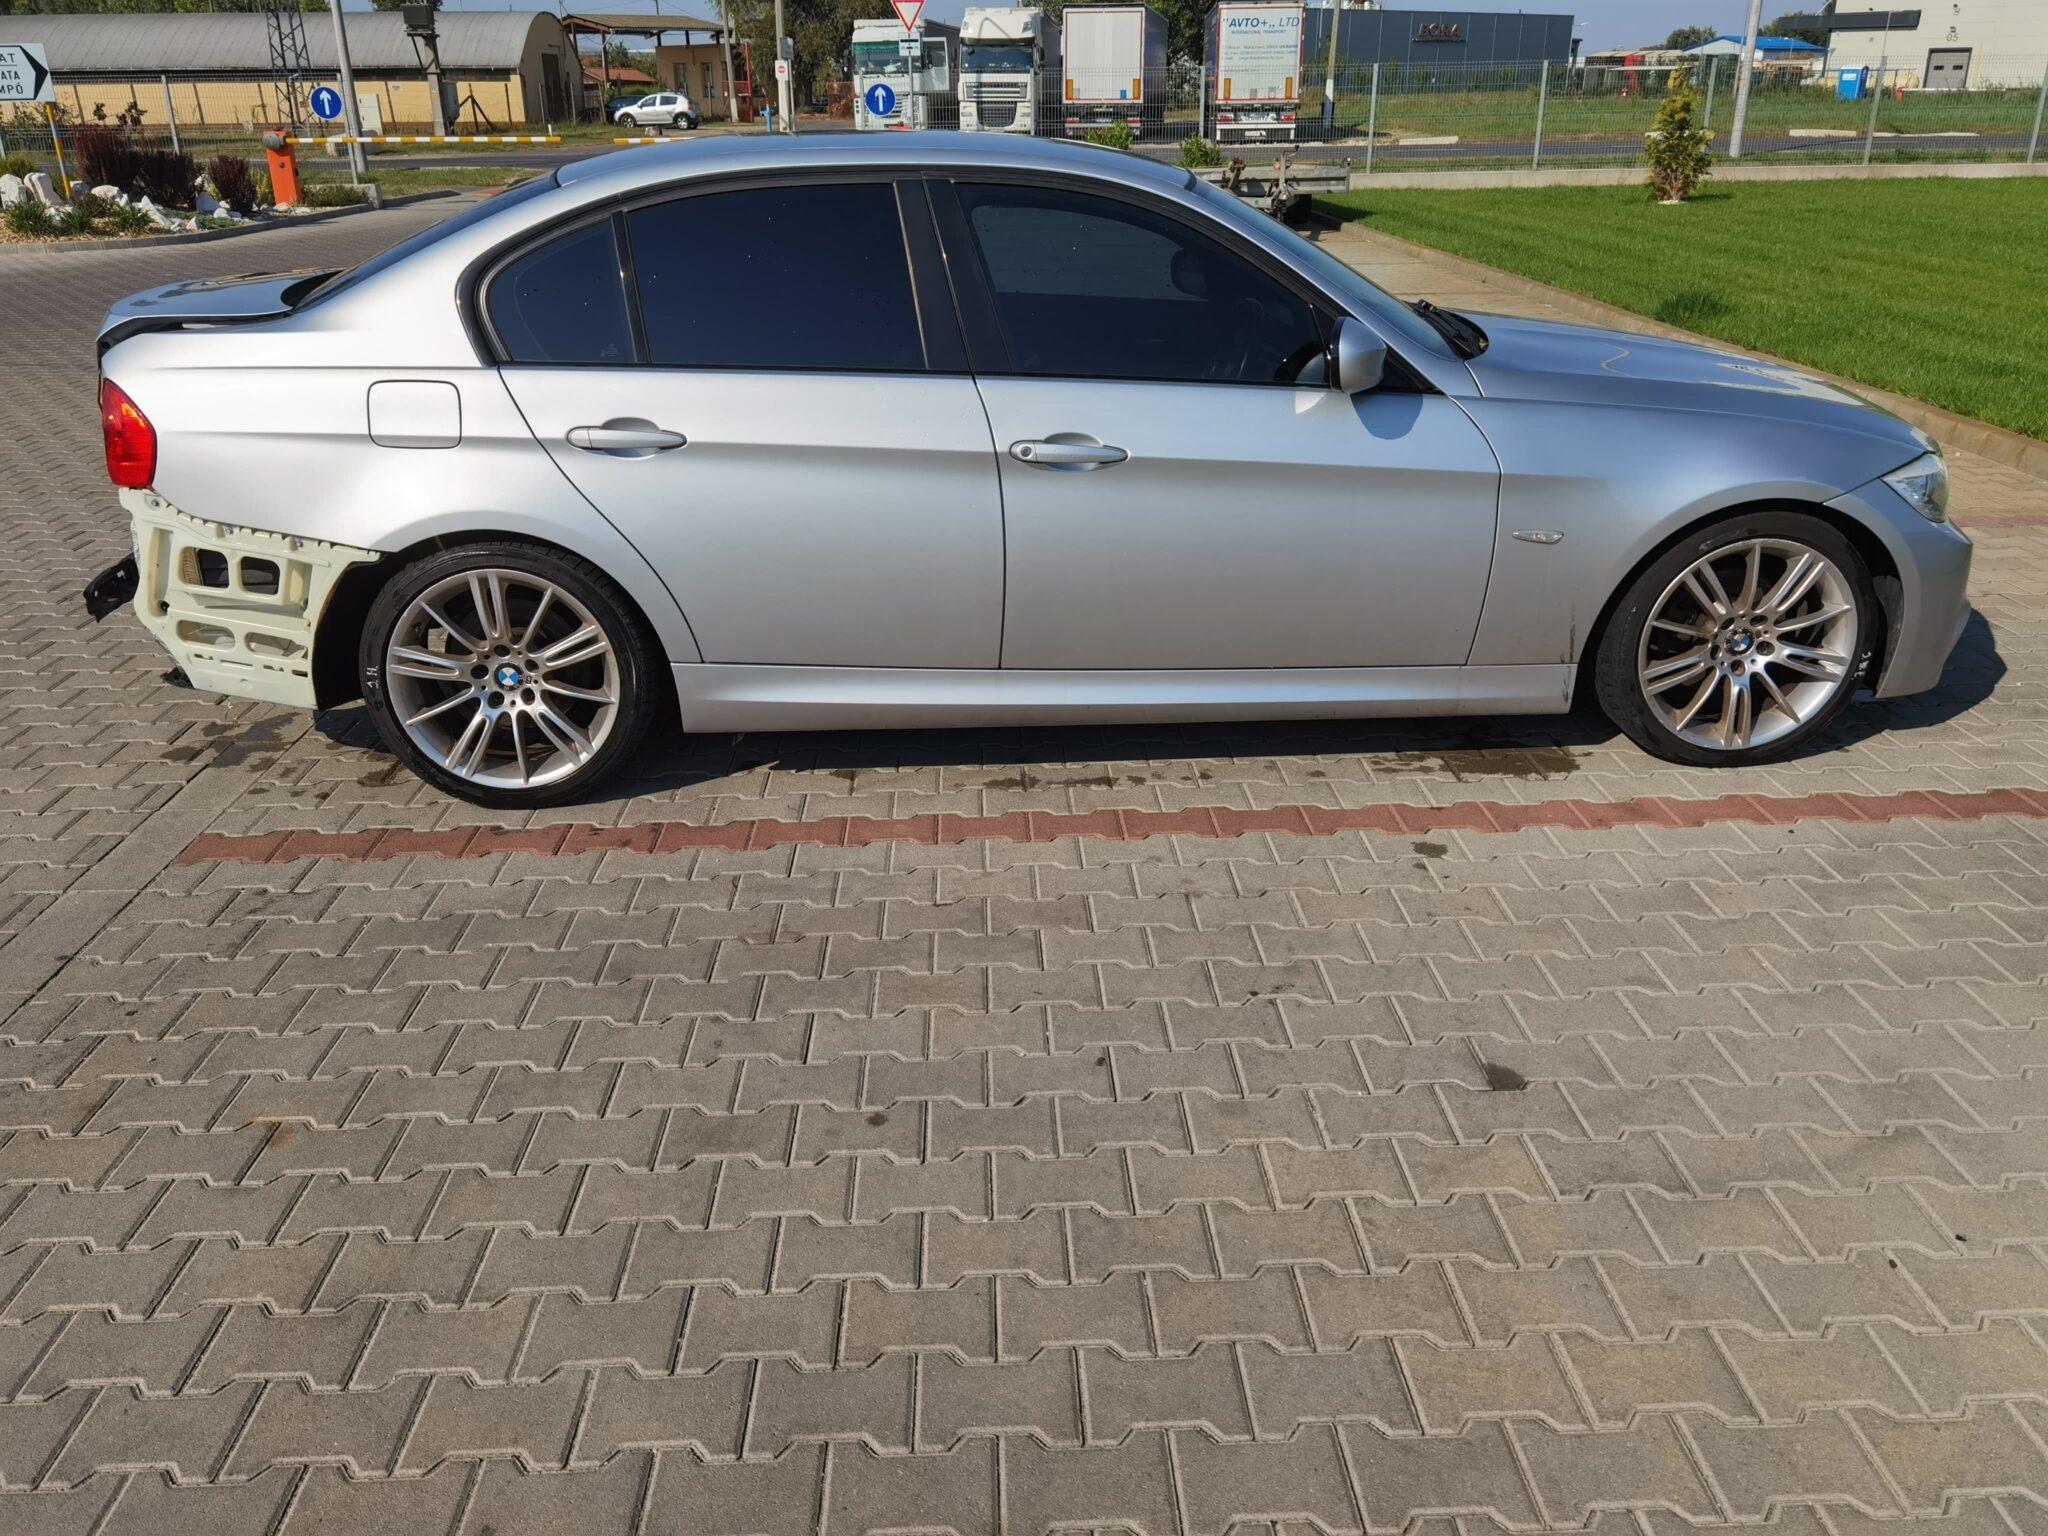 BMW E90 lci 318d Carbon Car Center Békéscsaba-9